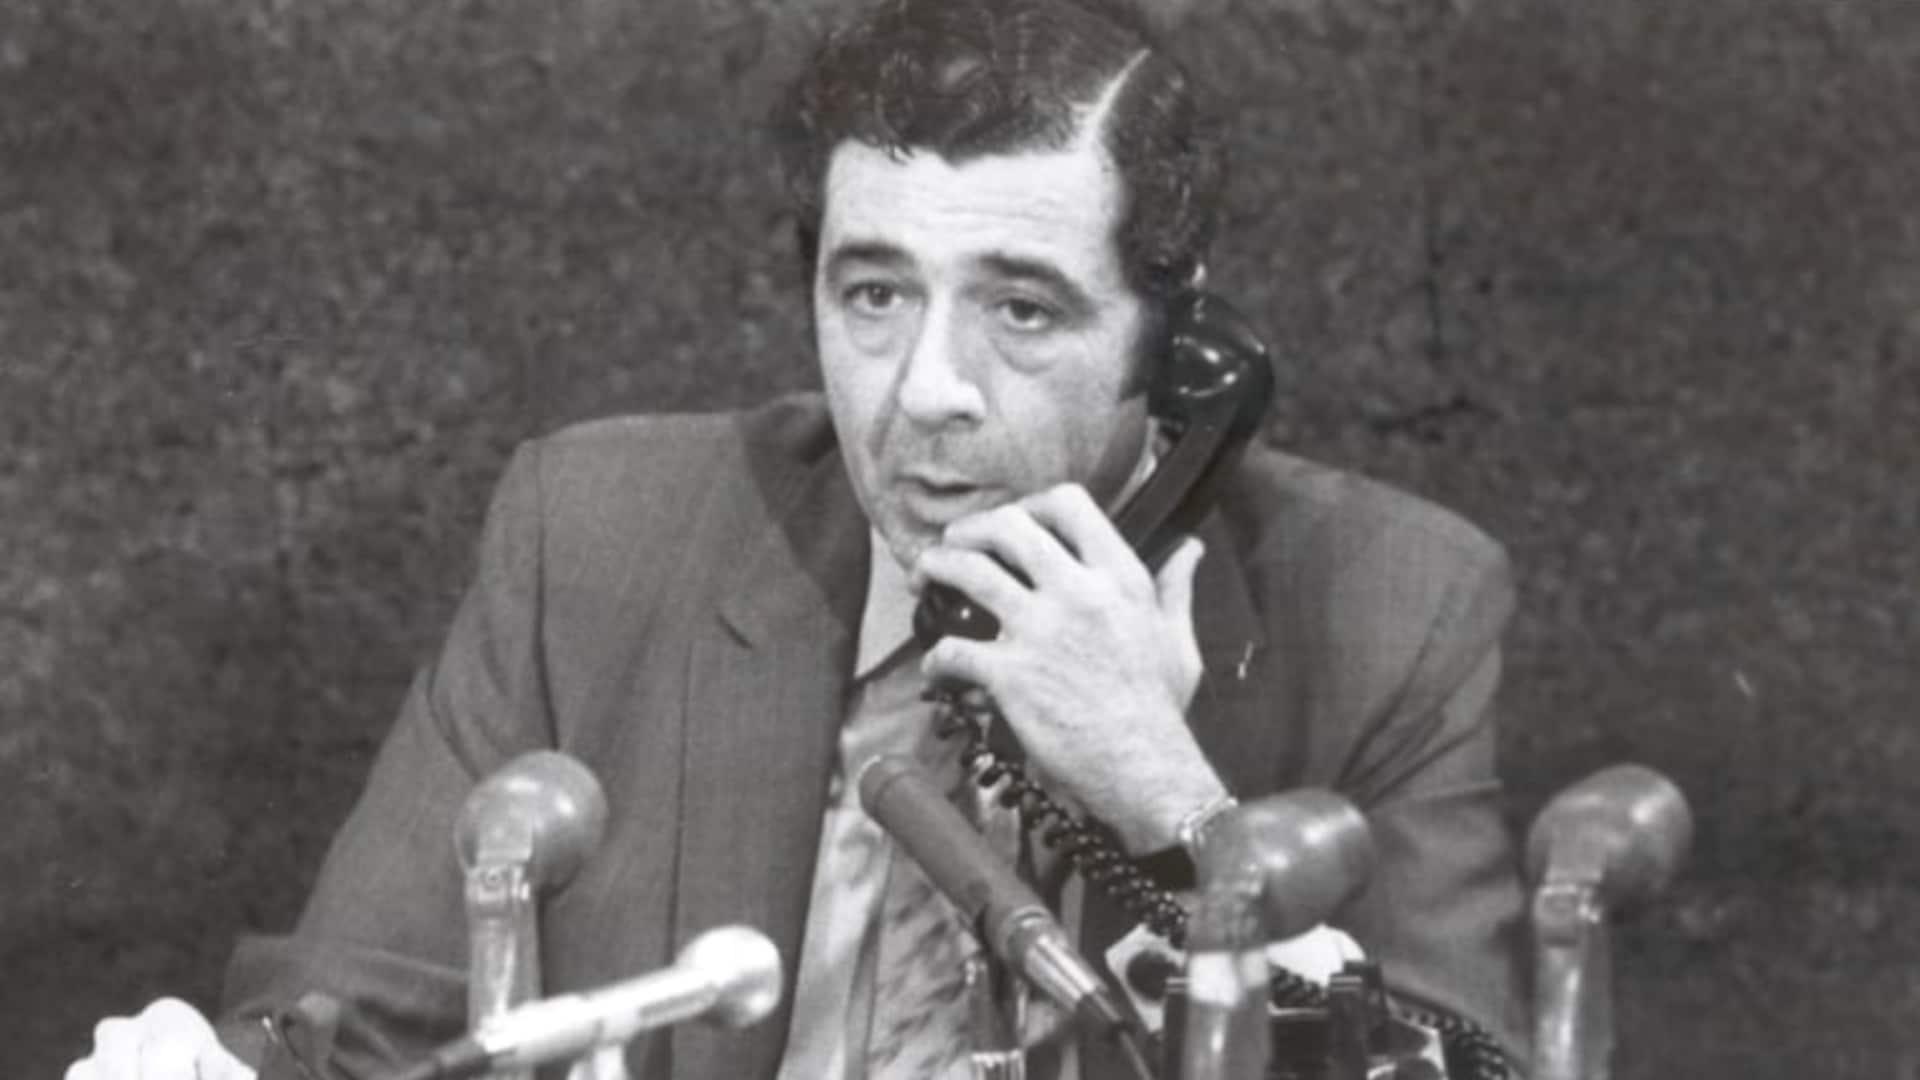 Trail Blazers mourn the loss of founder, president emeritus Harry Glickman